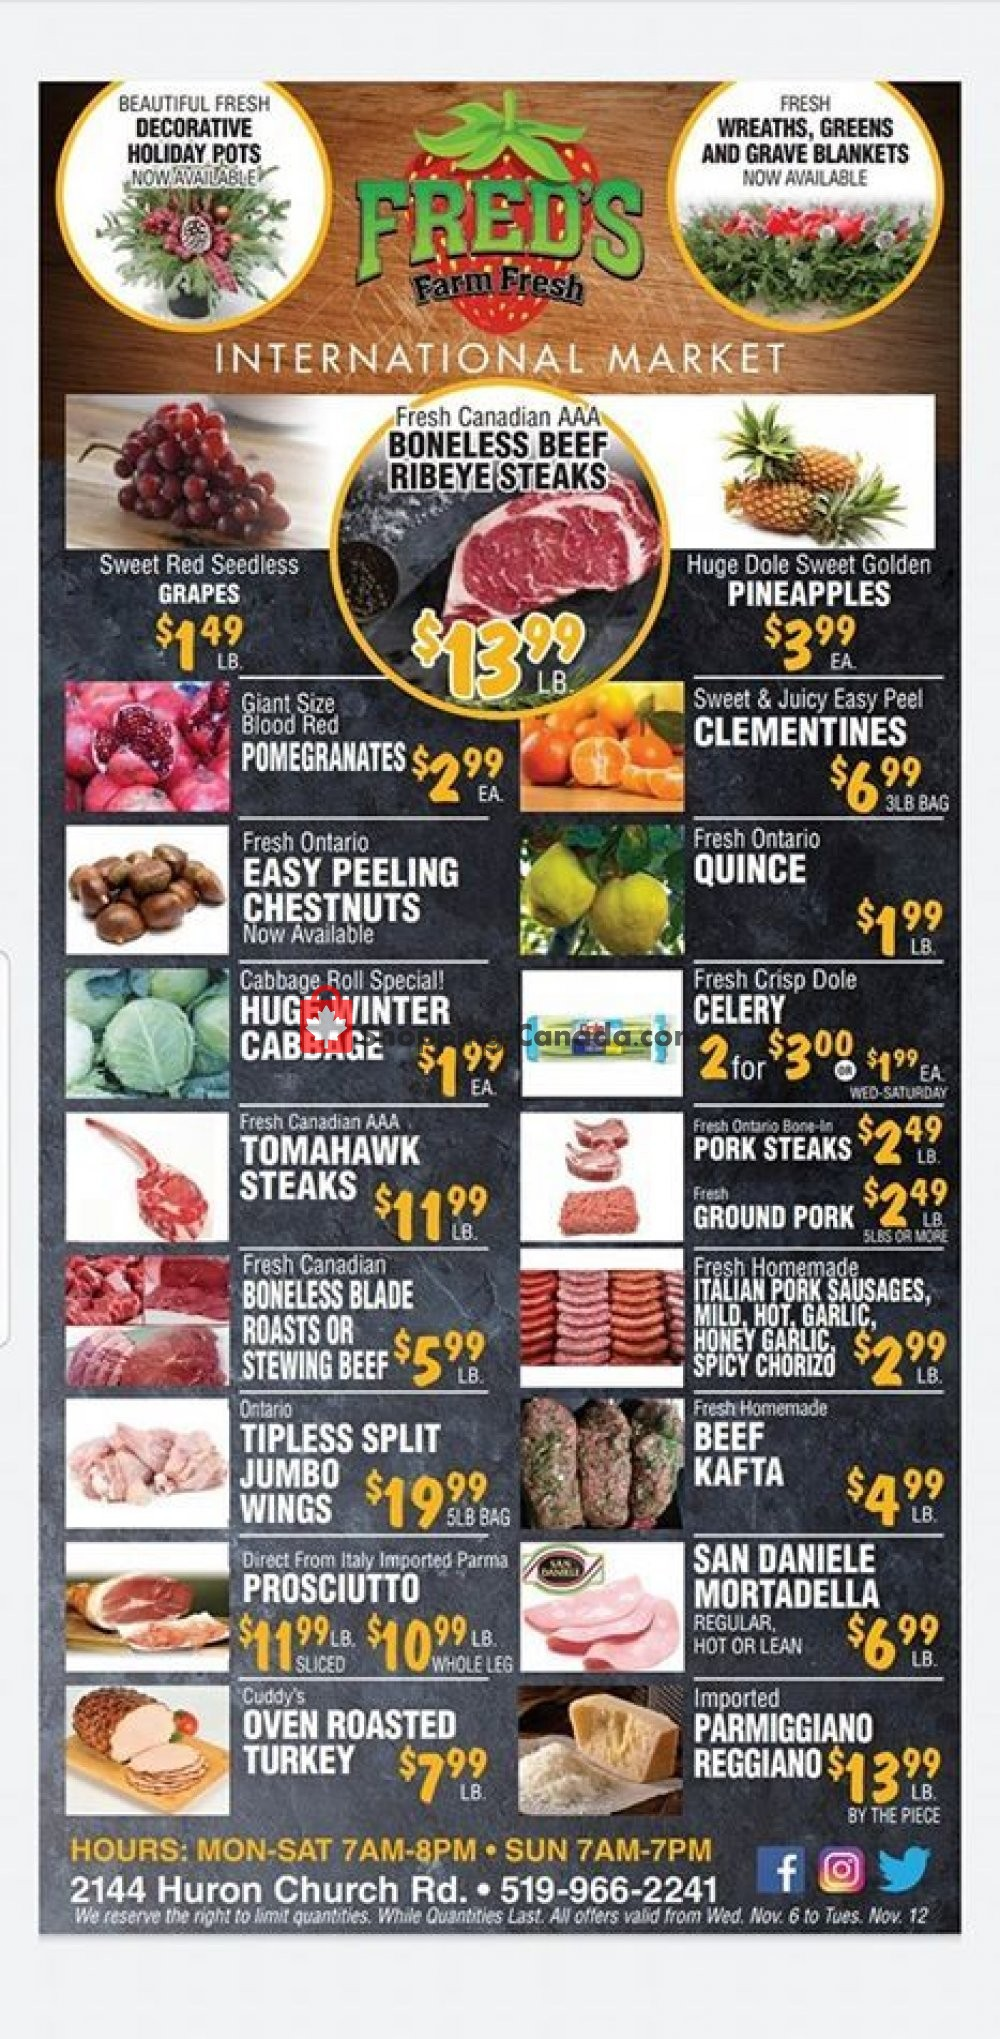 Flyer Fred's Farm Fresh Canada - from Wednesday November 6, 2019 to Tuesday November 12, 2019